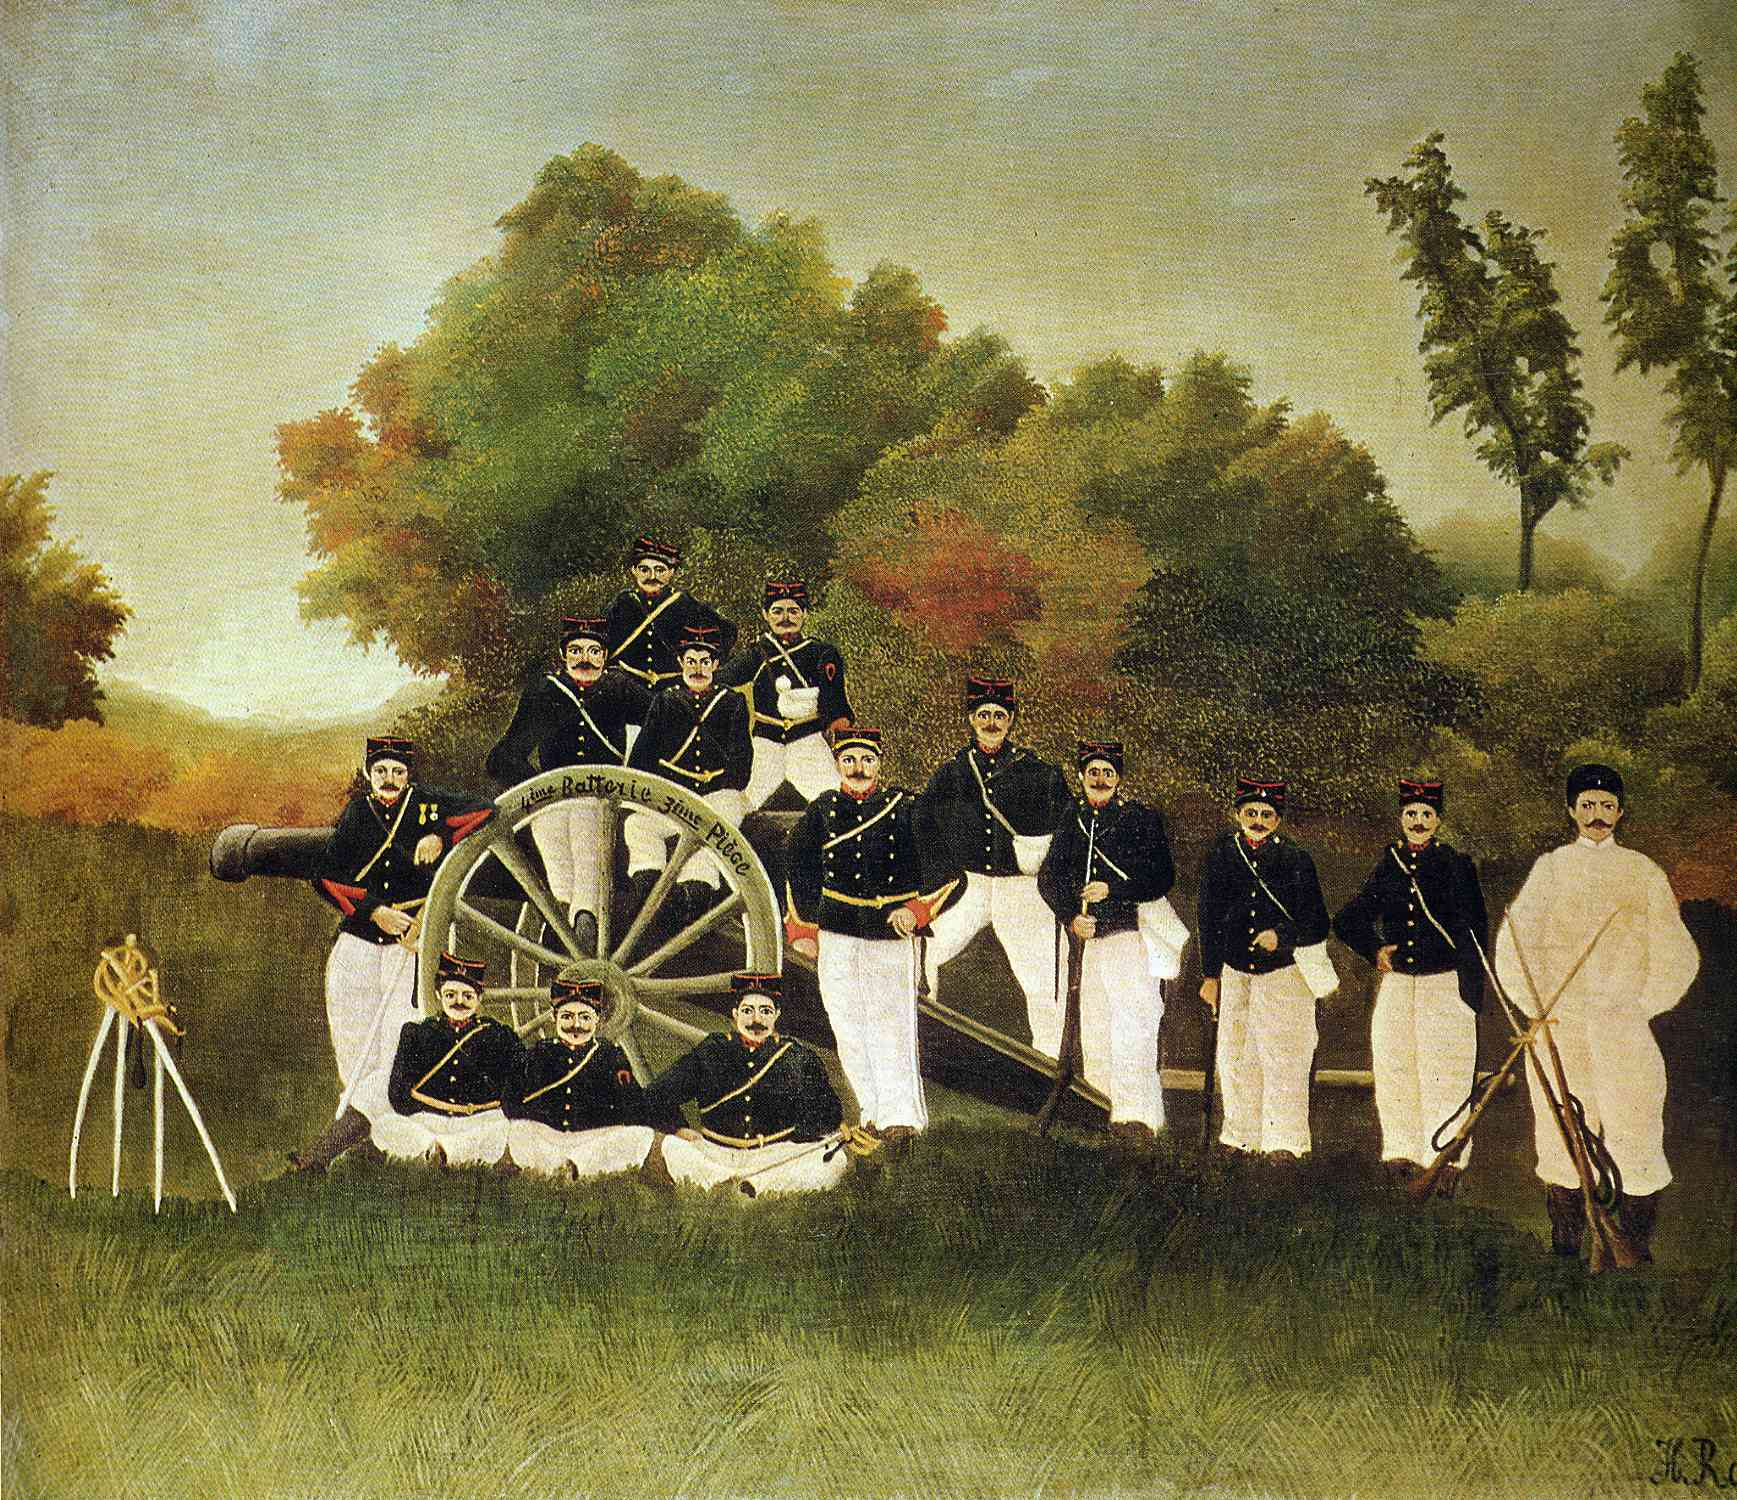 The Artillerymen, 1893